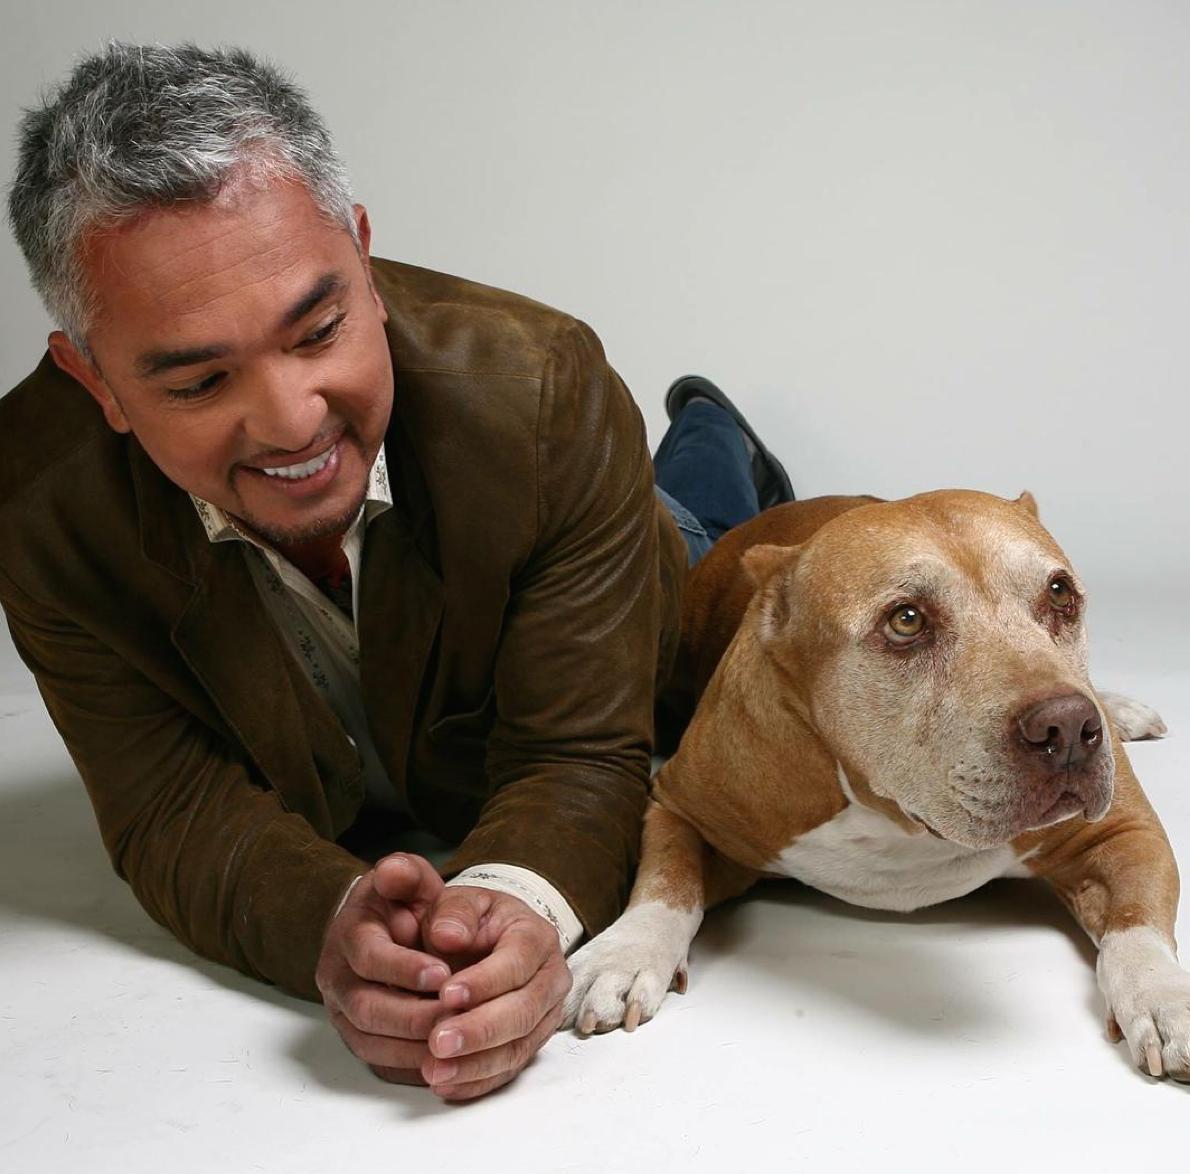 Happy National Dog Day! Larry King Talks to 'Dog Whisperer' @cesarmillan http://t.co/xBx2z9pnp9 @kingsthings http://t.co/8AdcFBVn6l